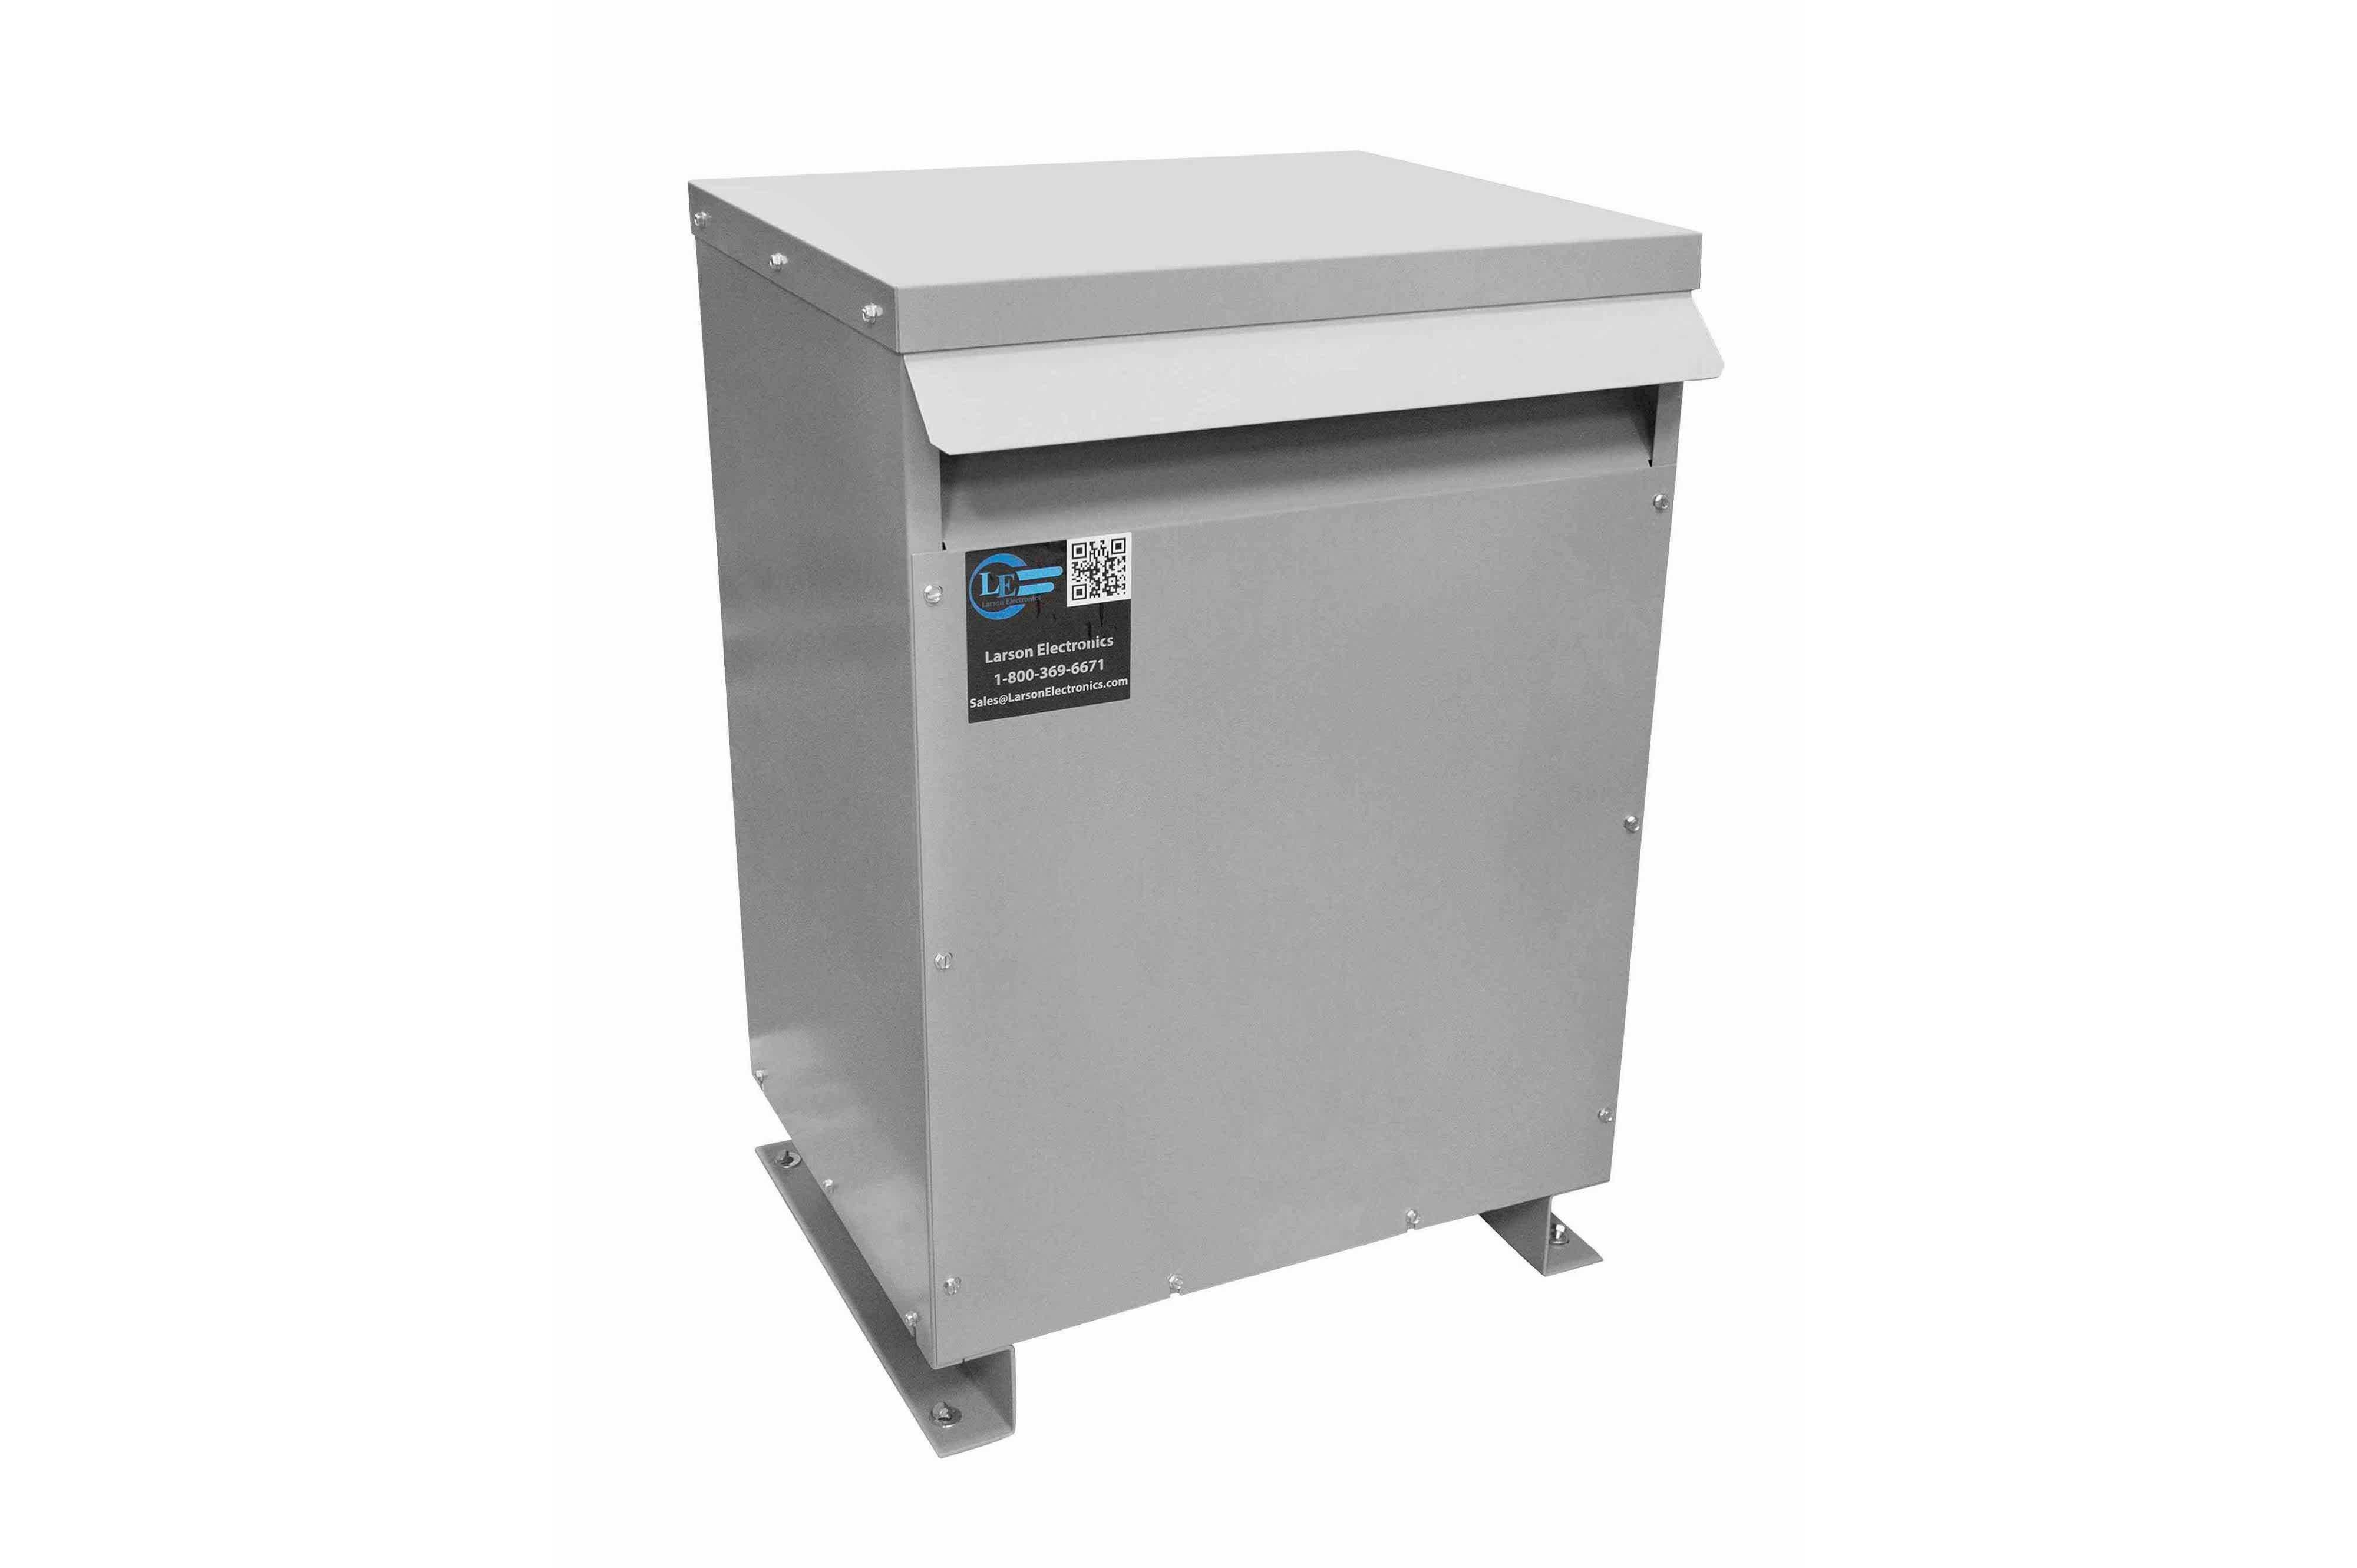 137.5 kVA 3PH Isolation Transformer, 480V Wye Primary, 208V Delta Secondary, N3R, Ventilated, 60 Hz